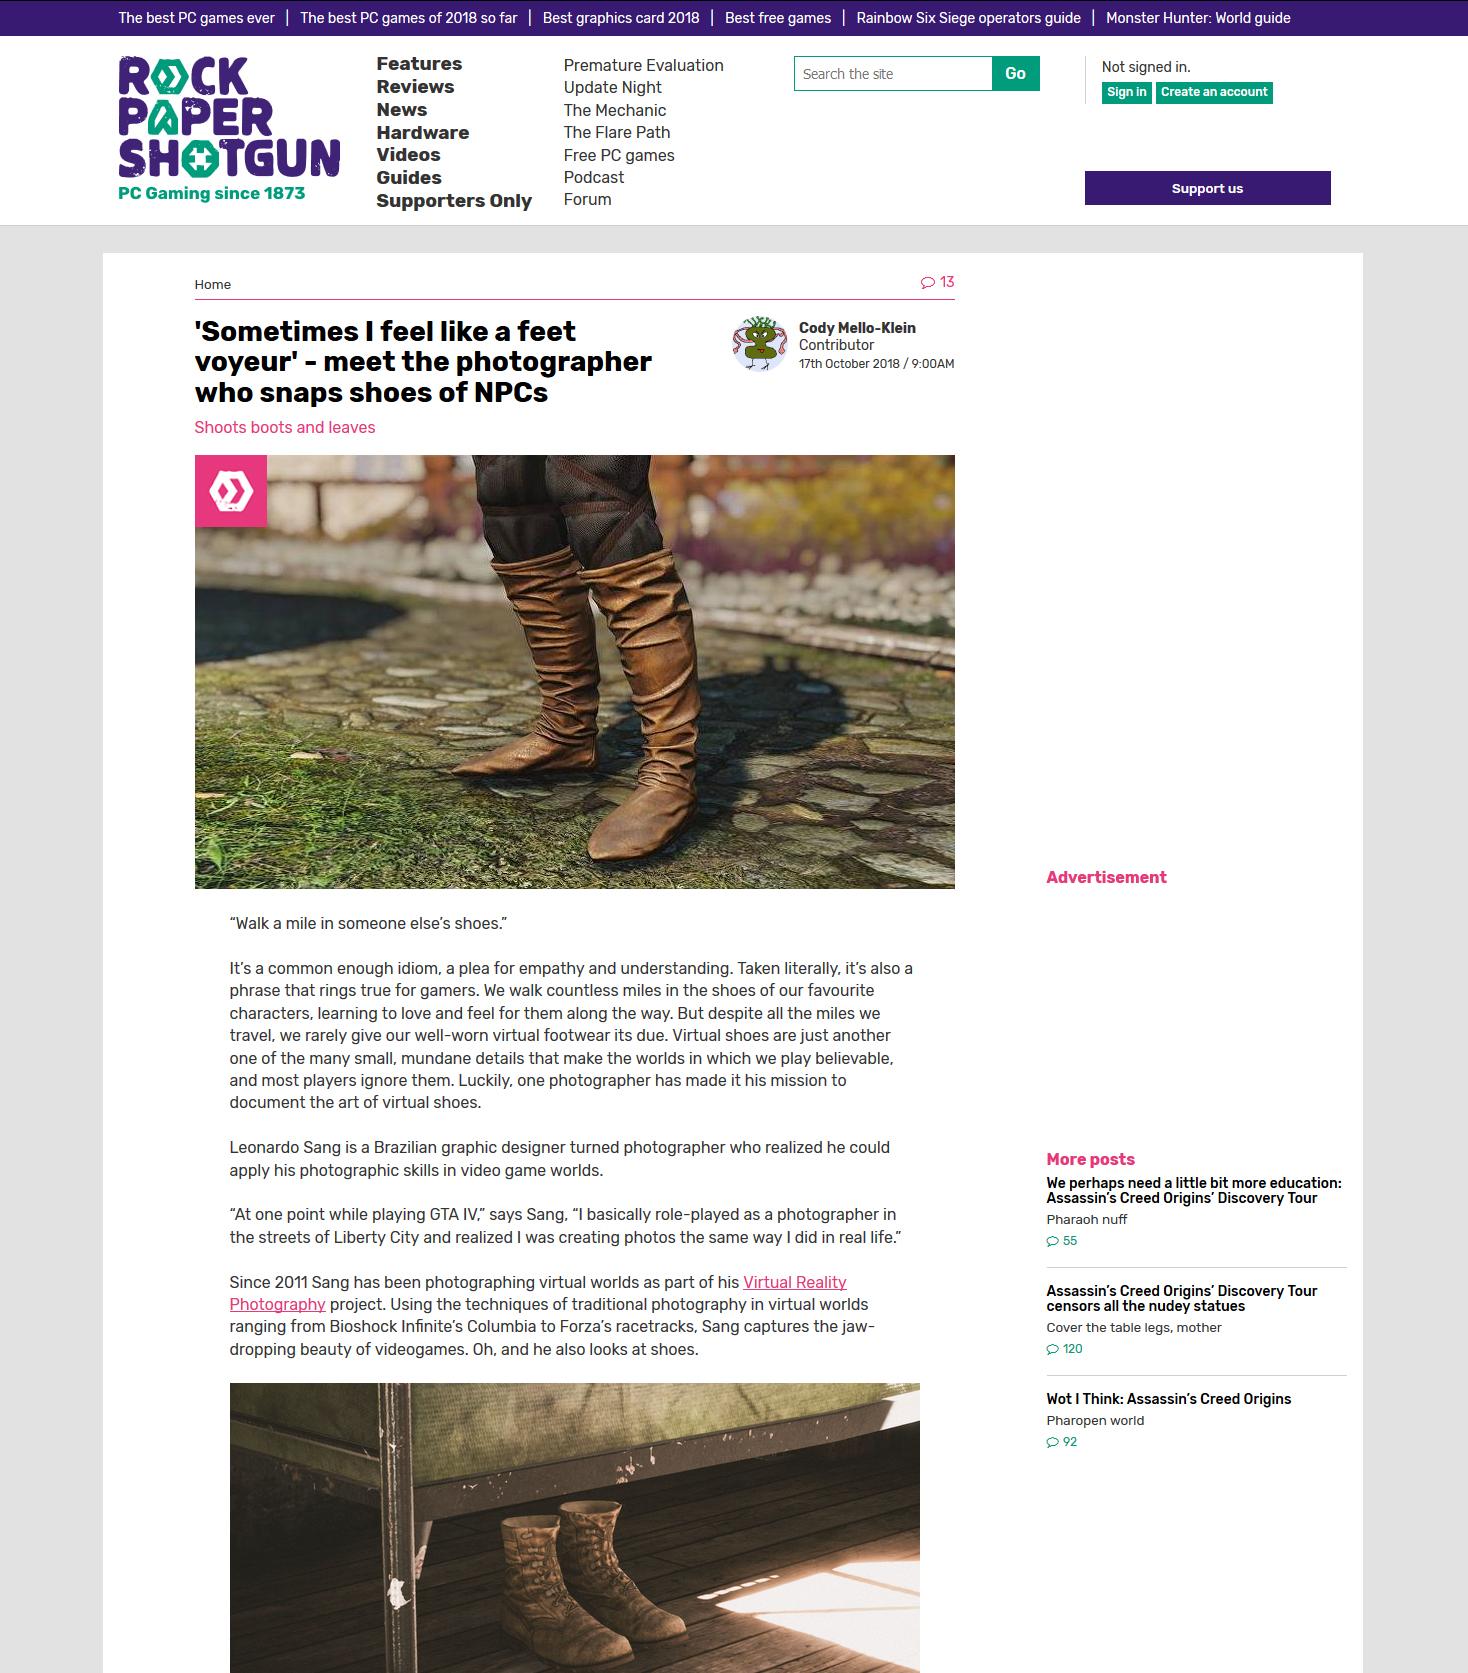 RPS_shoes91240.jpg